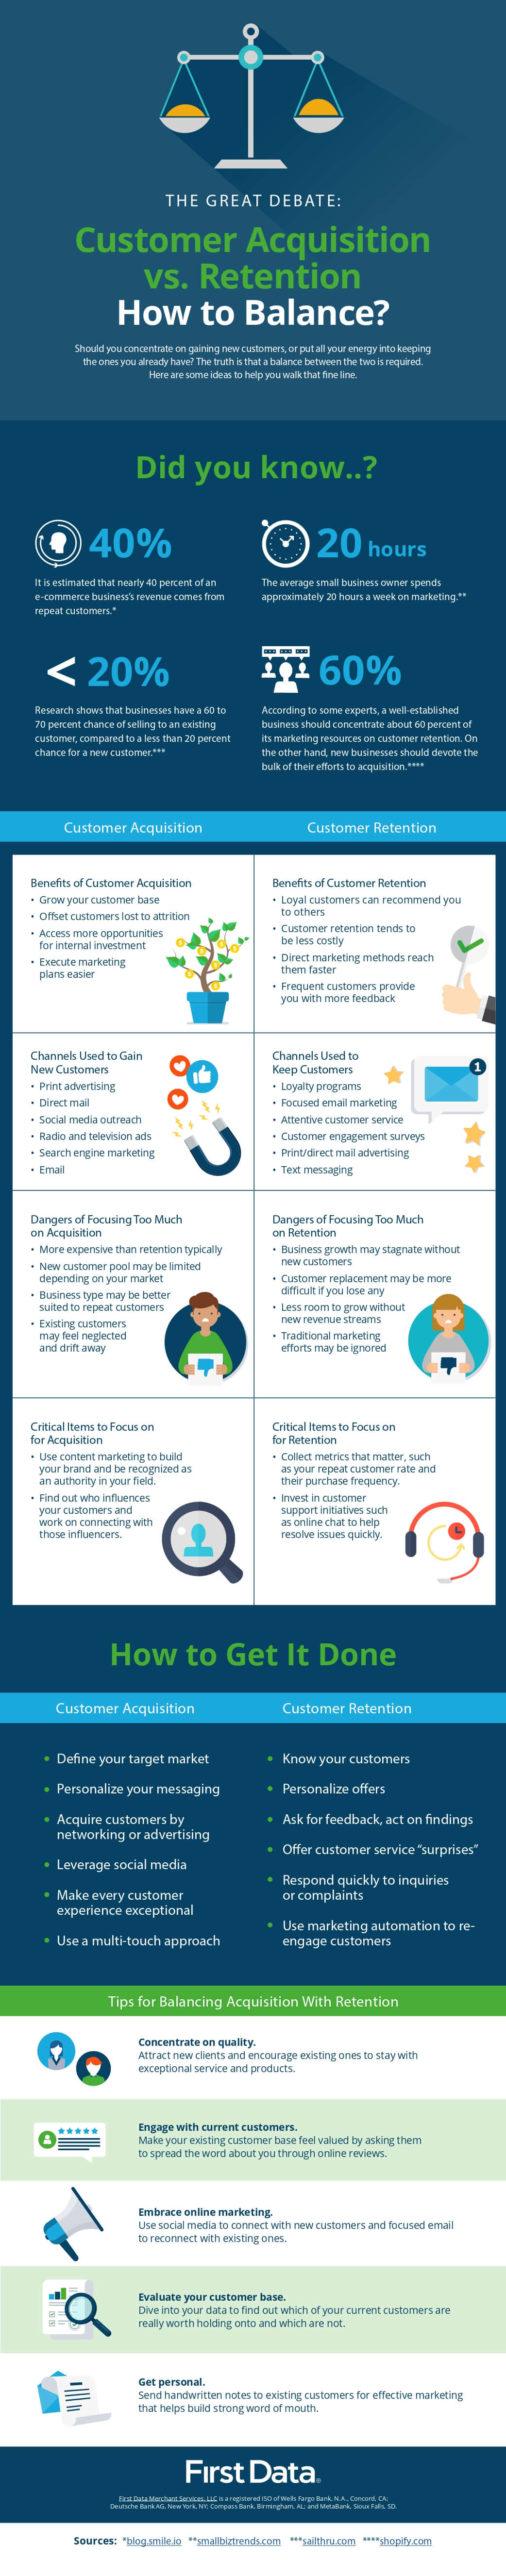 customer-acquisition-vs-customer-retention